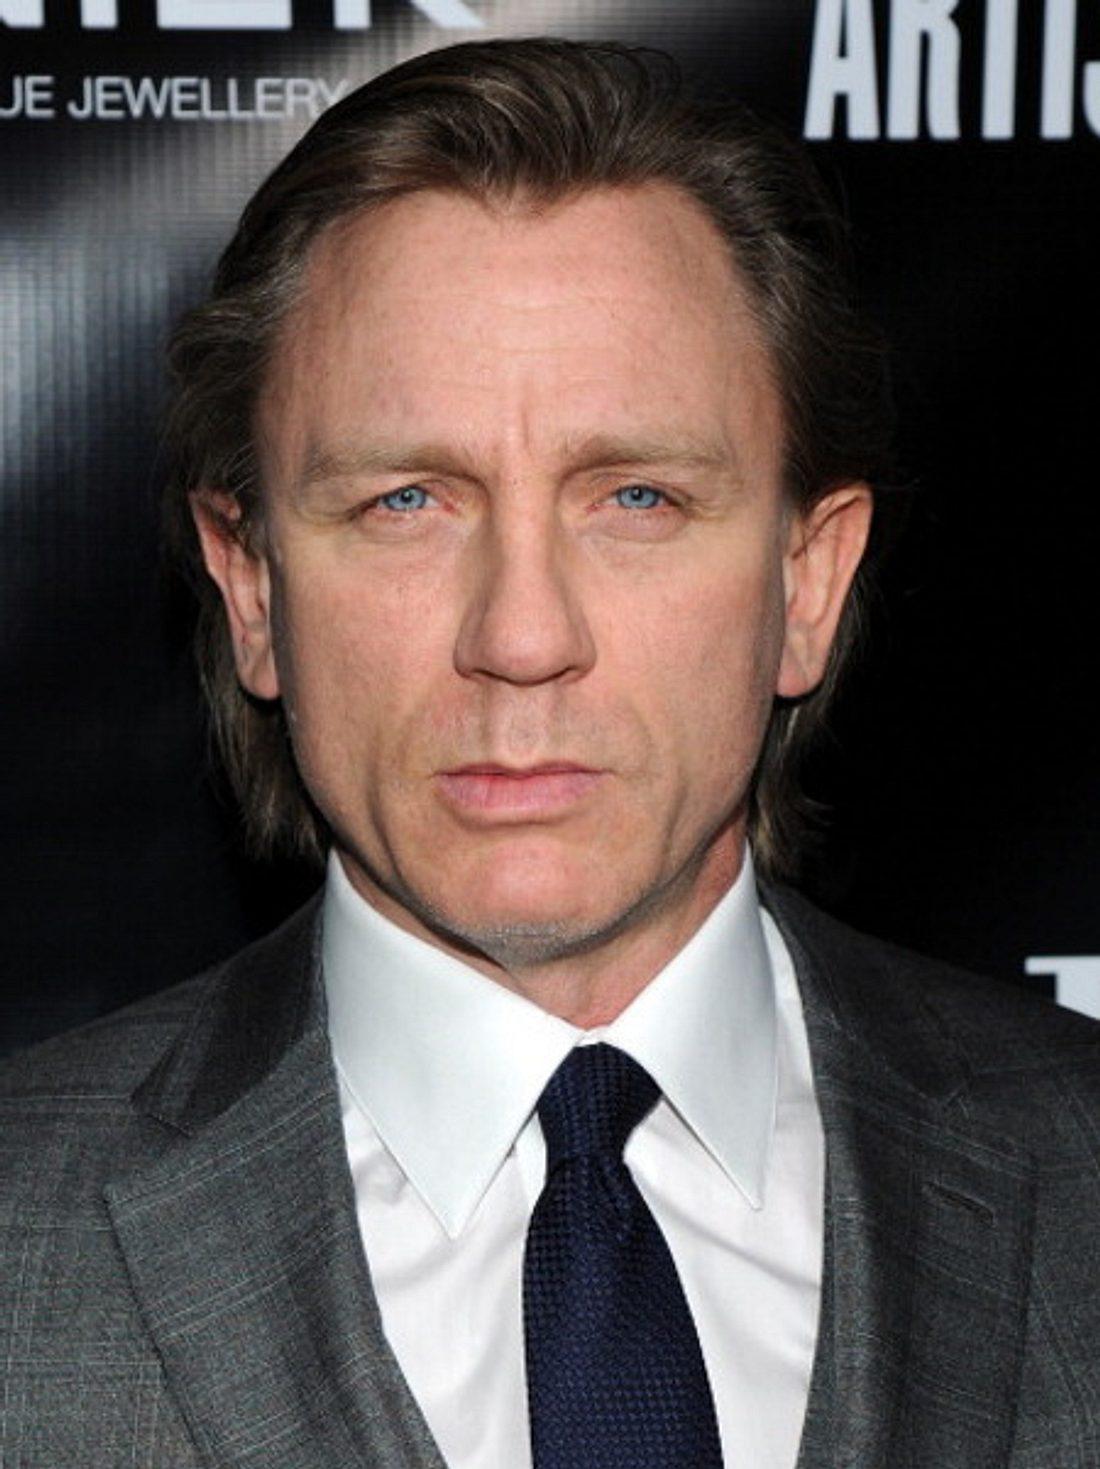 Daniel Craig hat jetzt lange Haare...